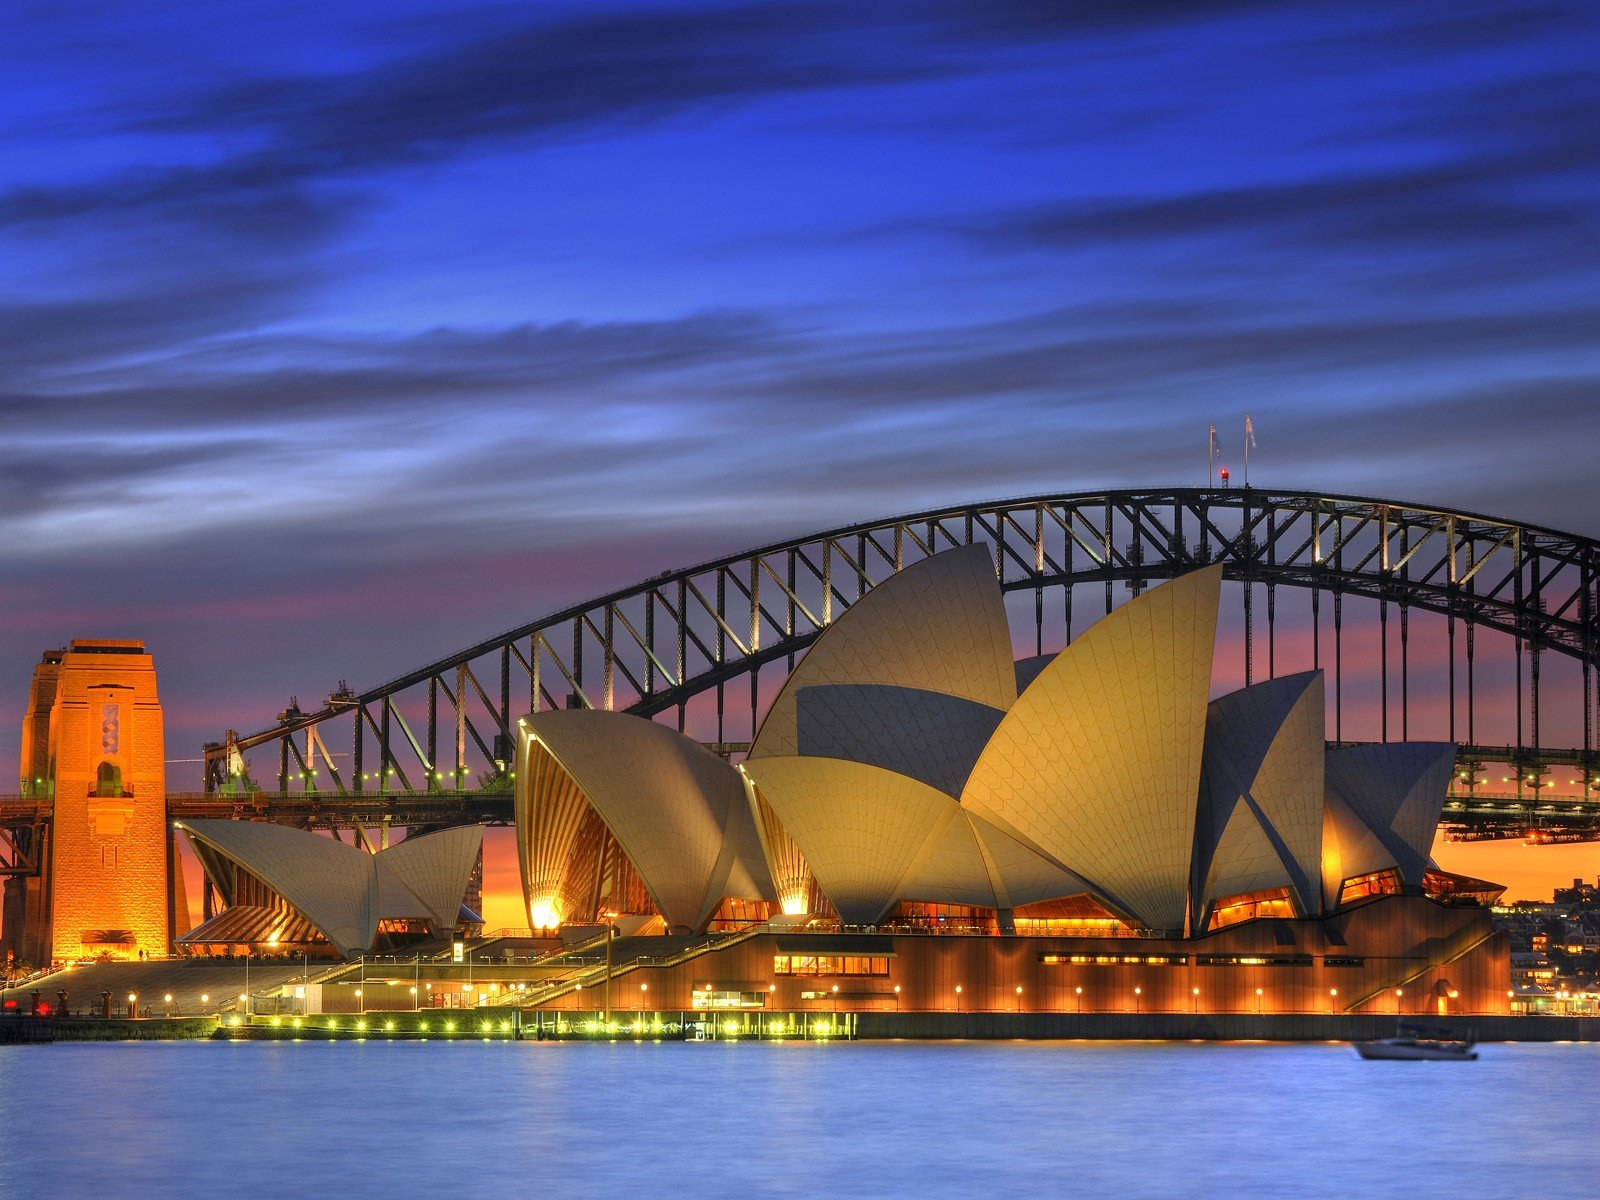 Harbor Sydney Opera House Sydney Harbour Bridge wallpaper background 1600x1200